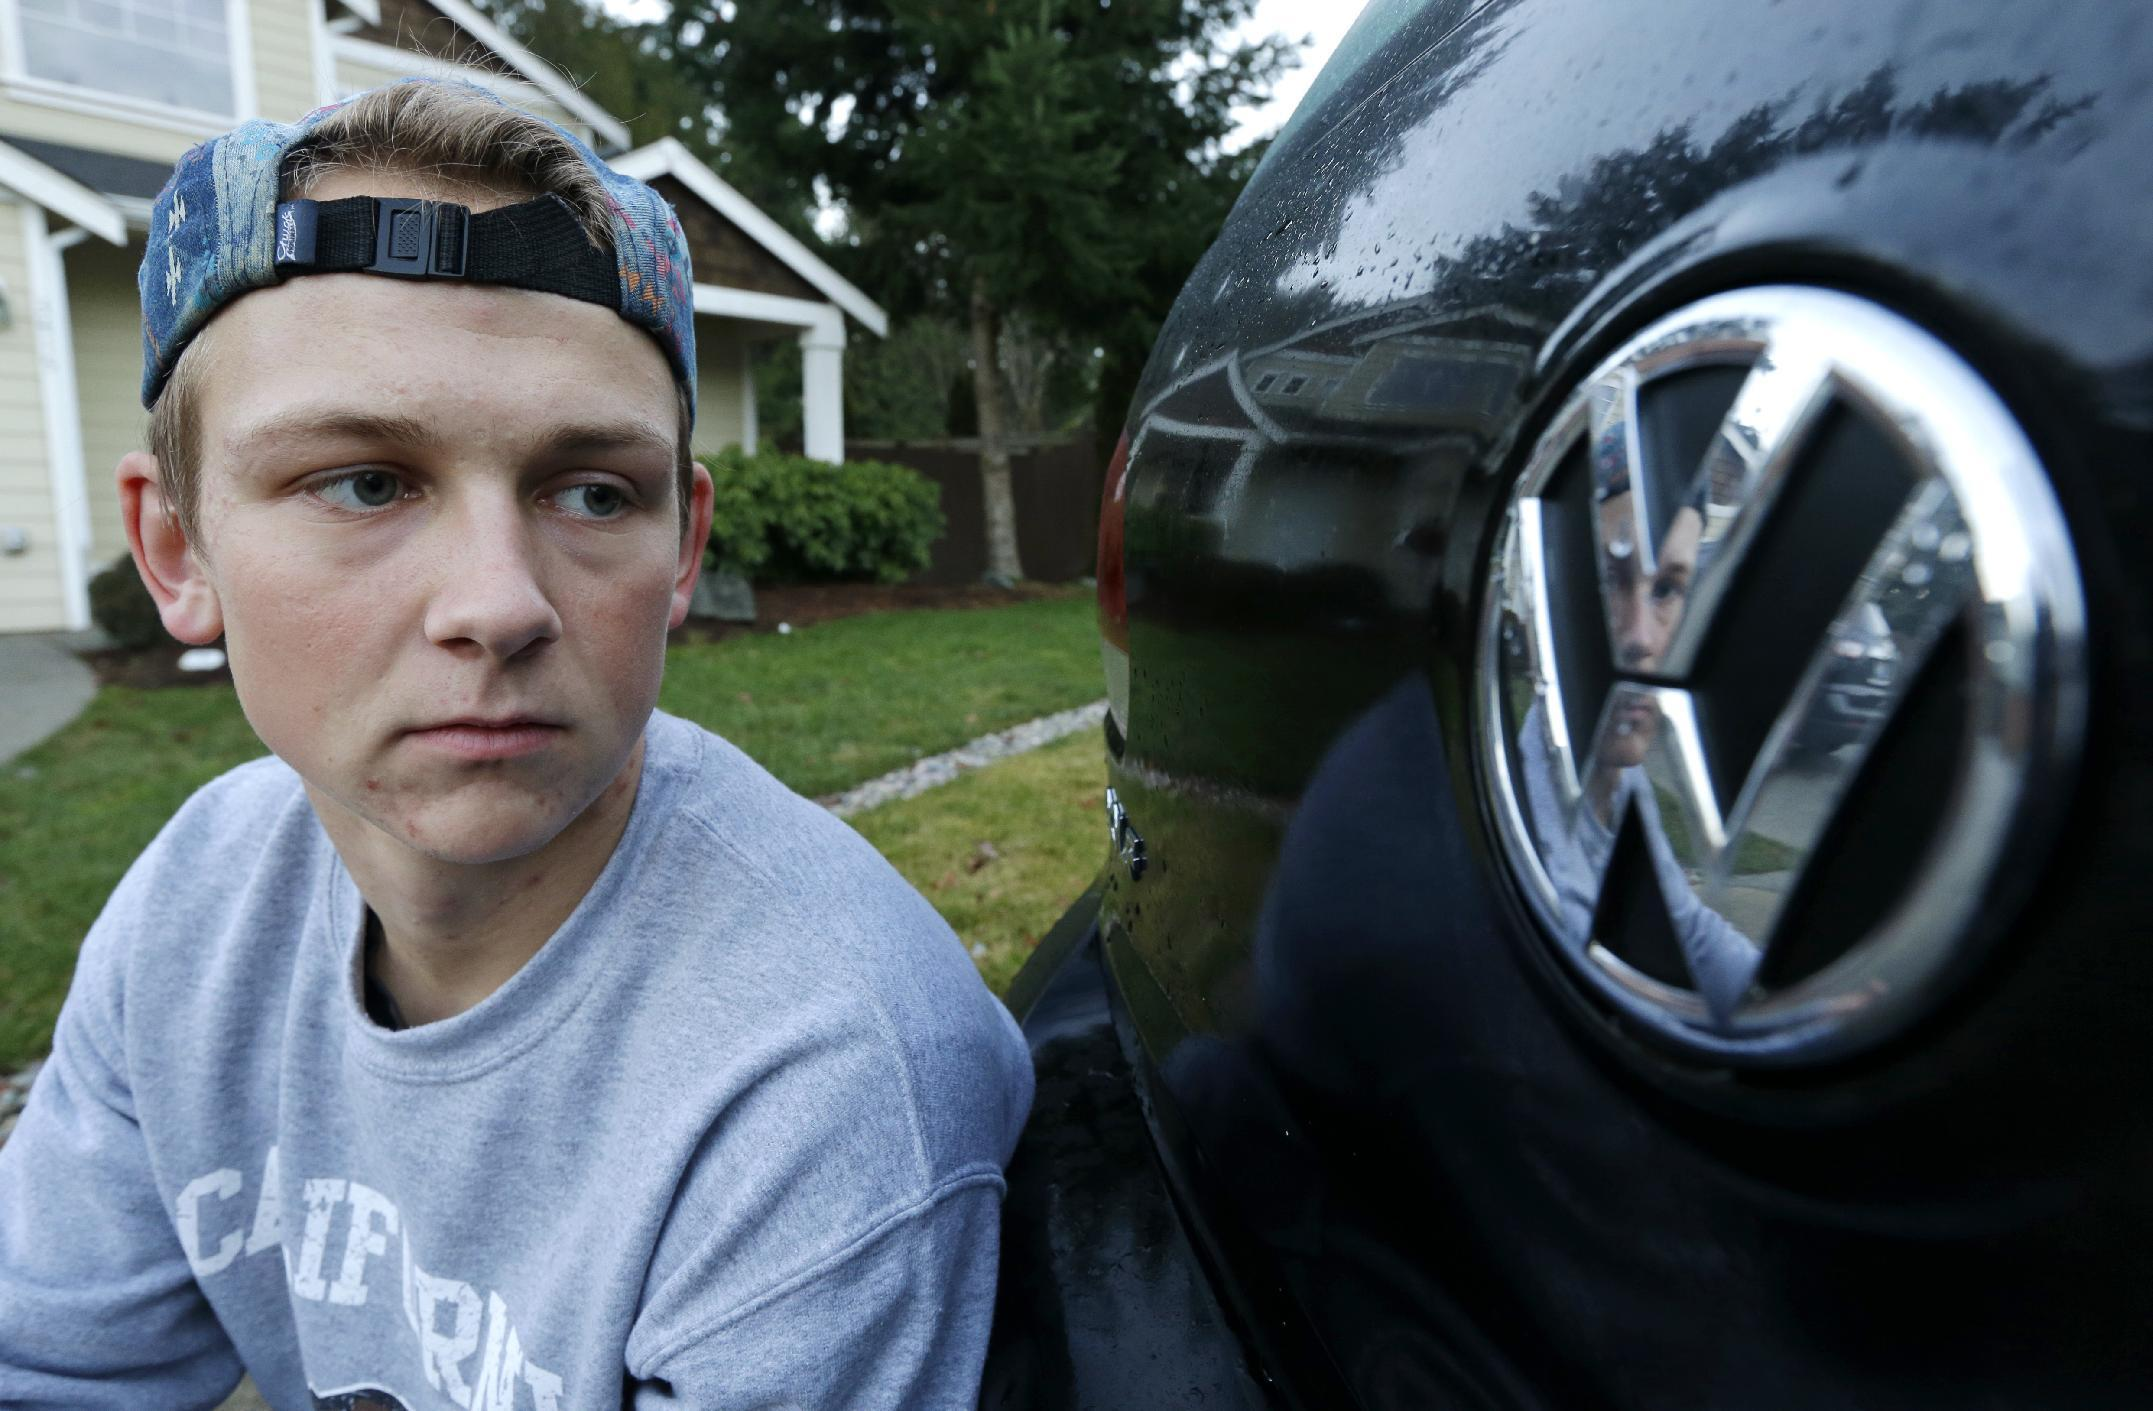 Vw Buyback Program >> Slow Fix Vw Diesel Owners Complain Of Buyback Delays